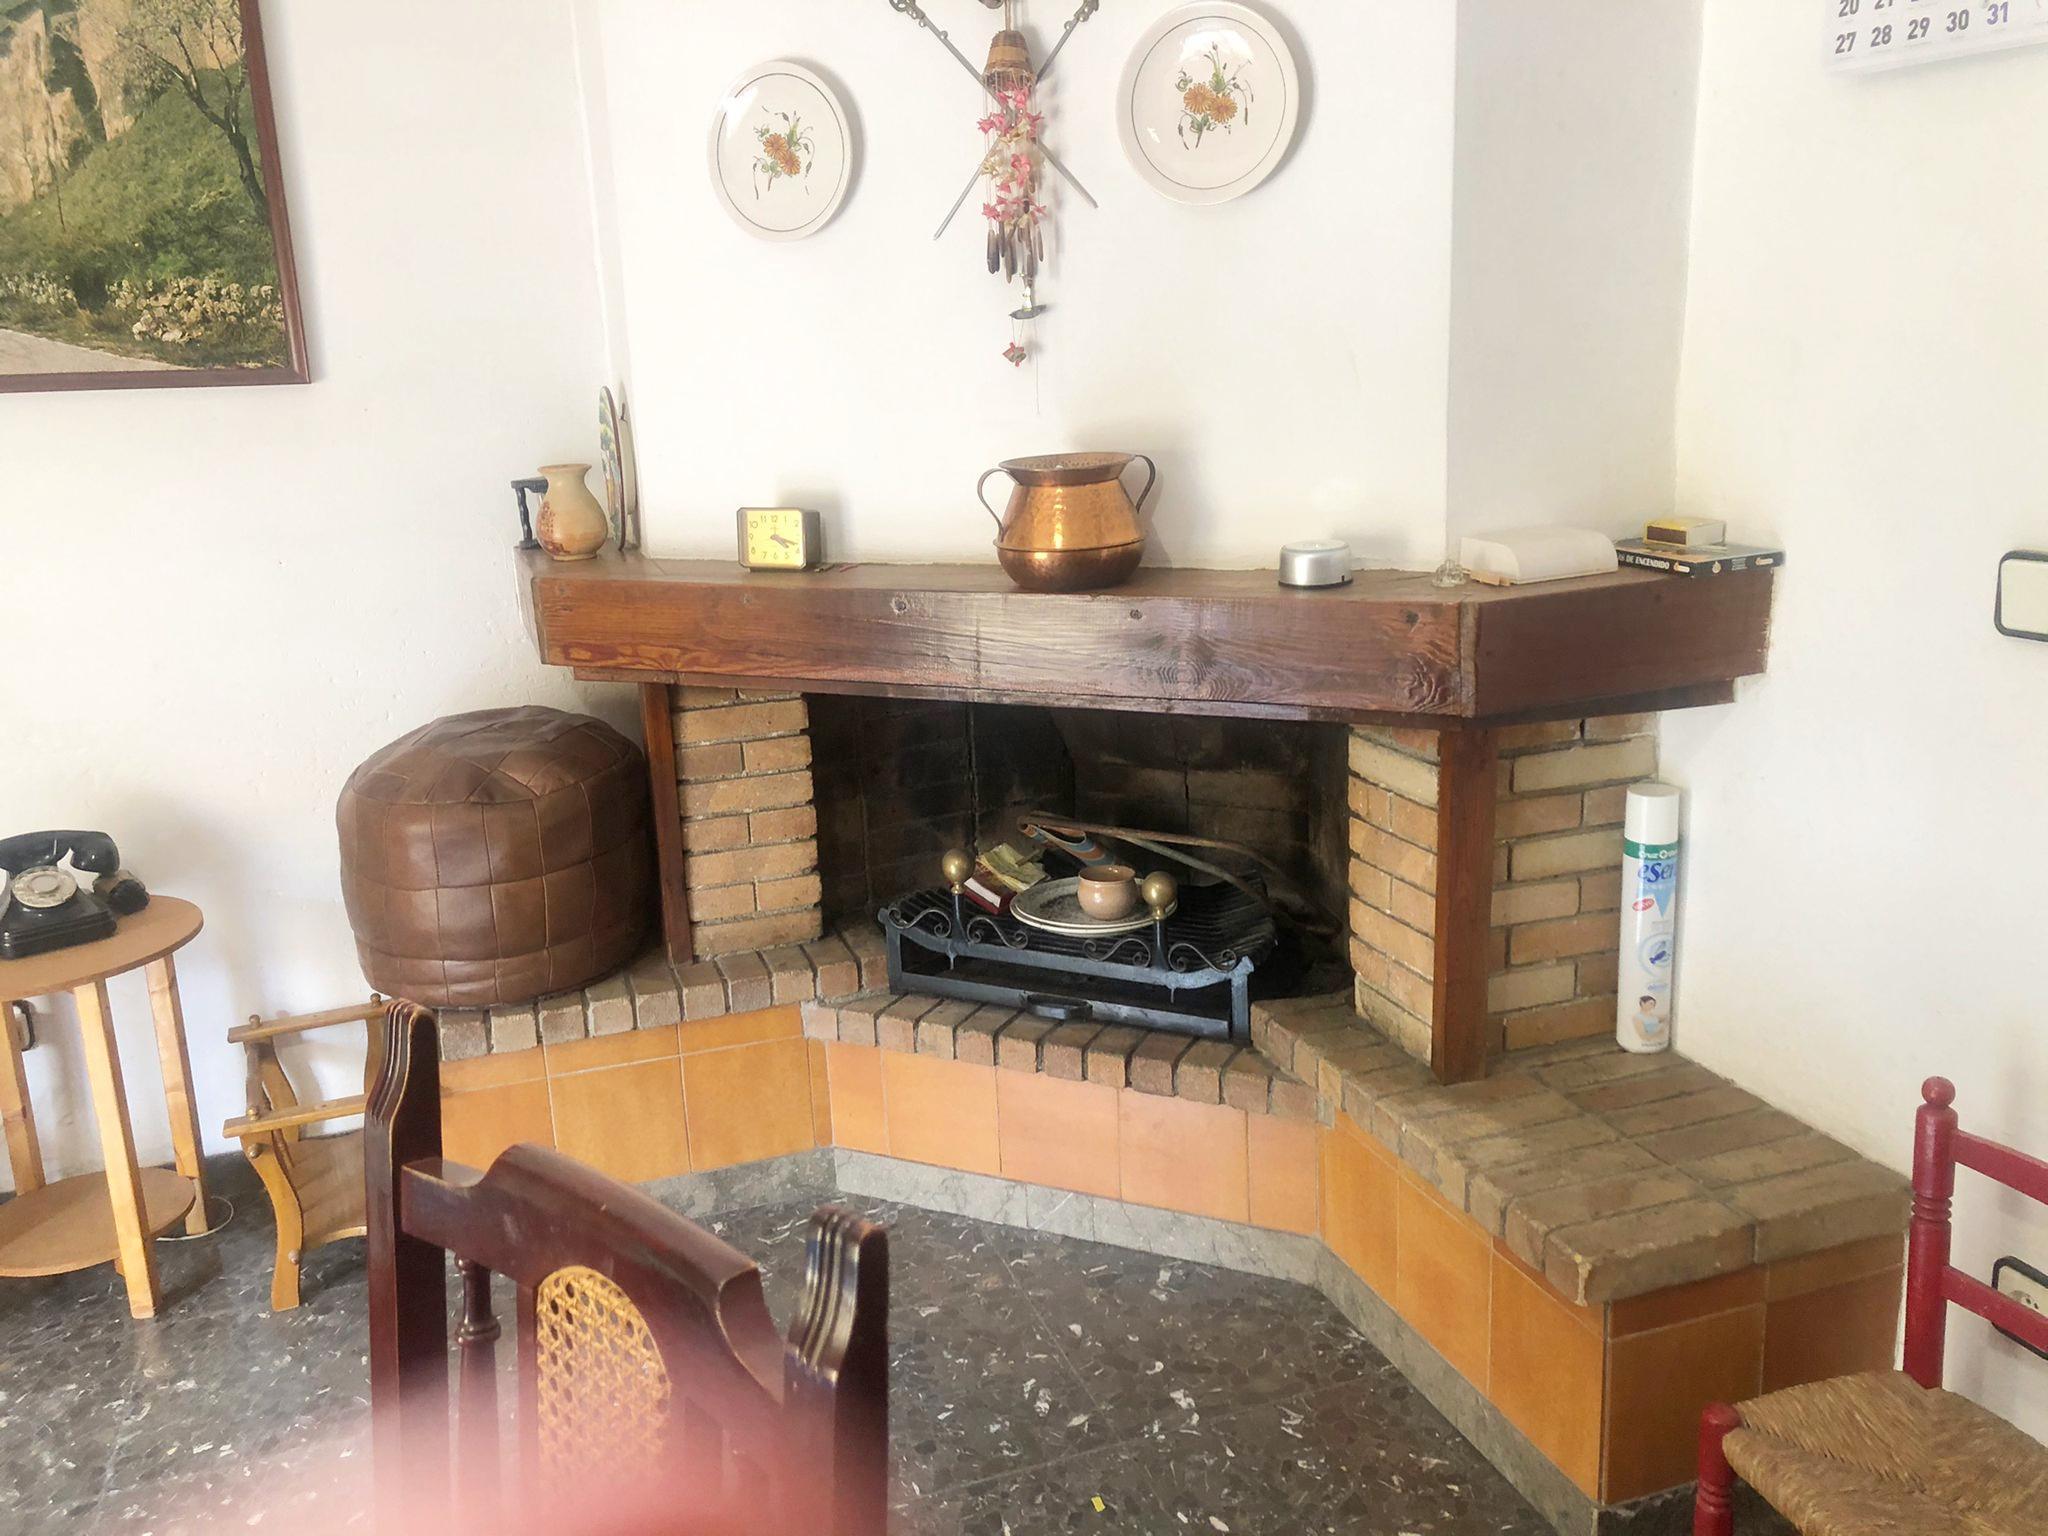 Imagen 2 Casa Aislada en venta en Montornès Del Vallès / Montornes del Valles- 2 viviendas-2 parcelas